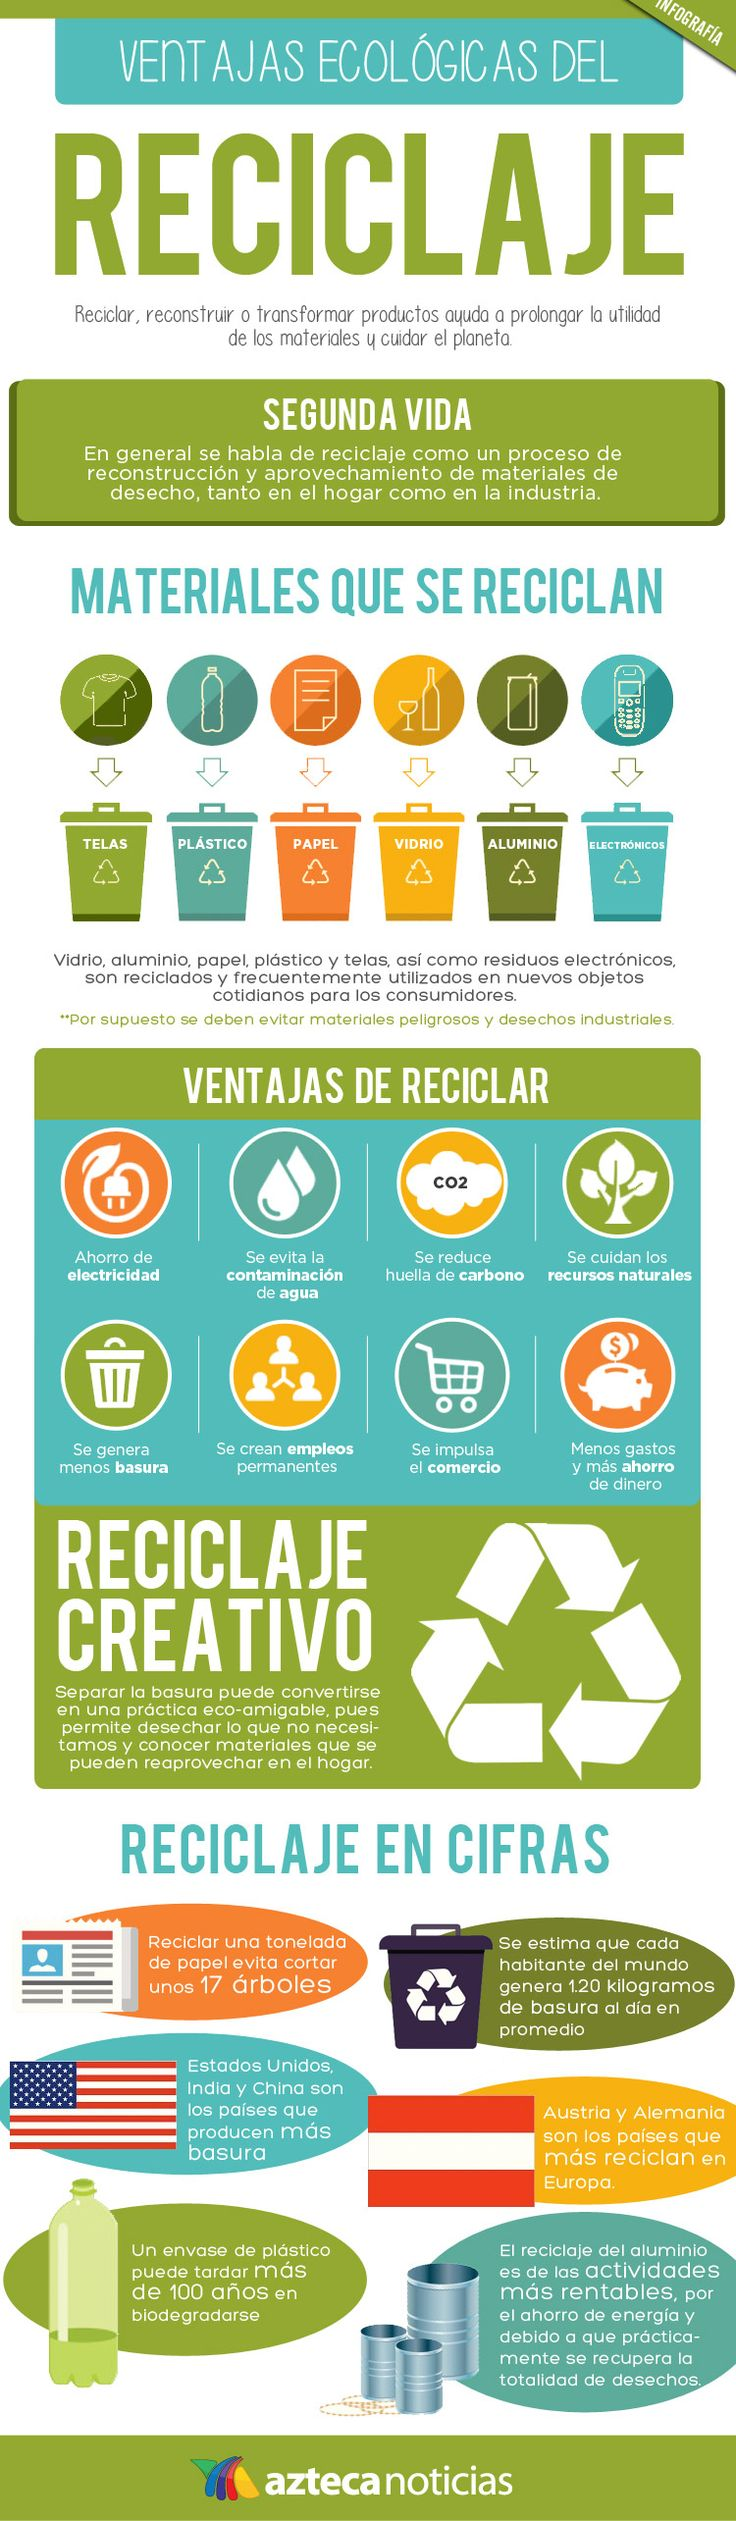 Ventajas ecológicas del reciclaje #infografia